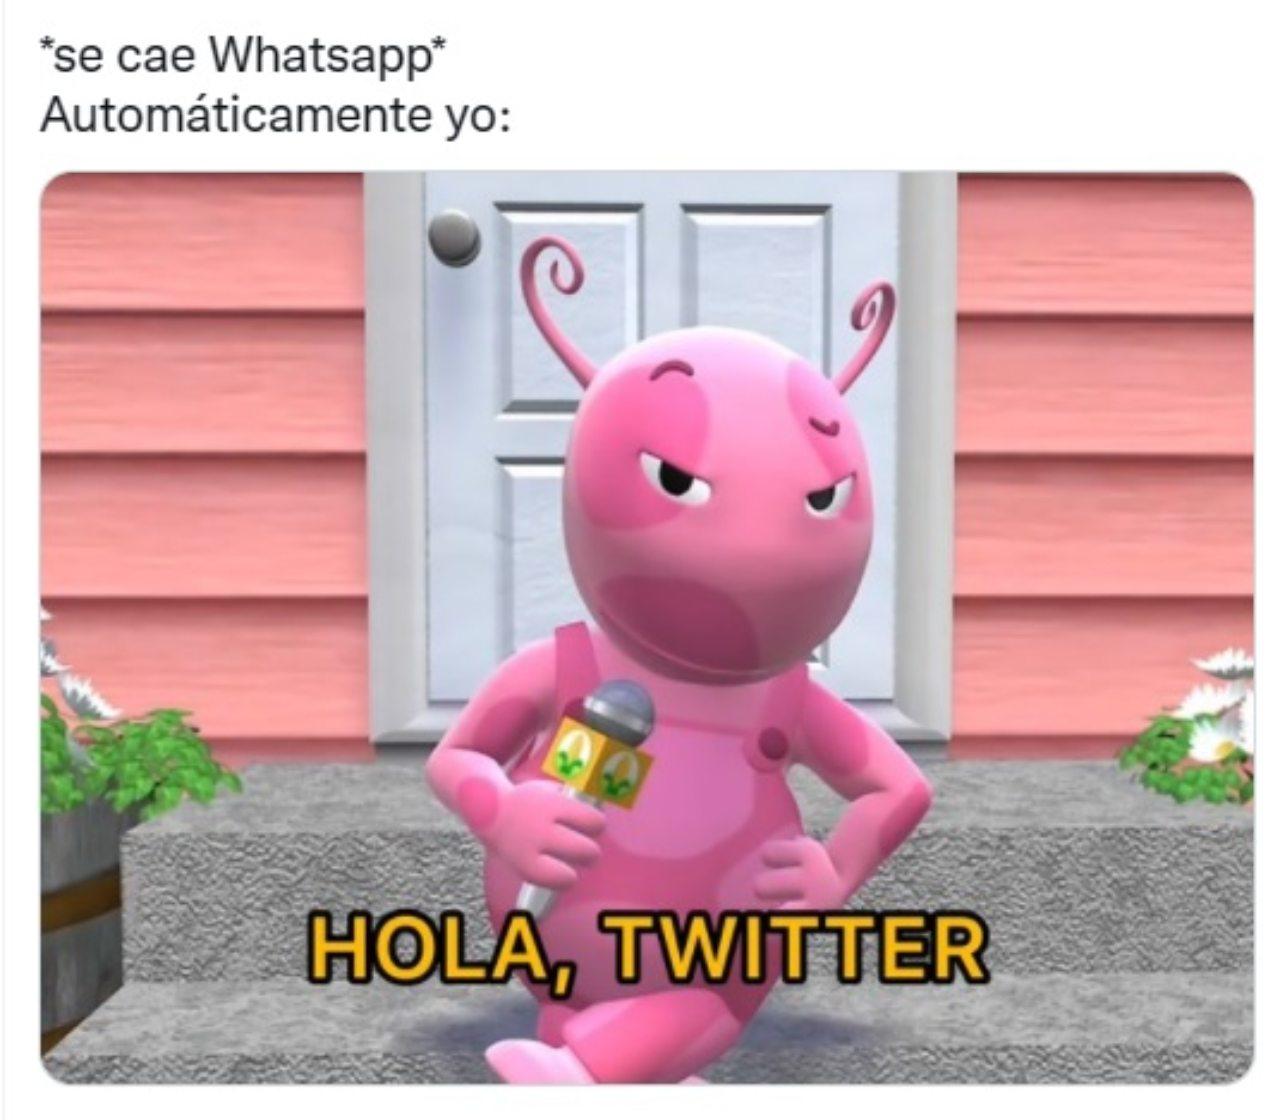 Meme caida redes sociales